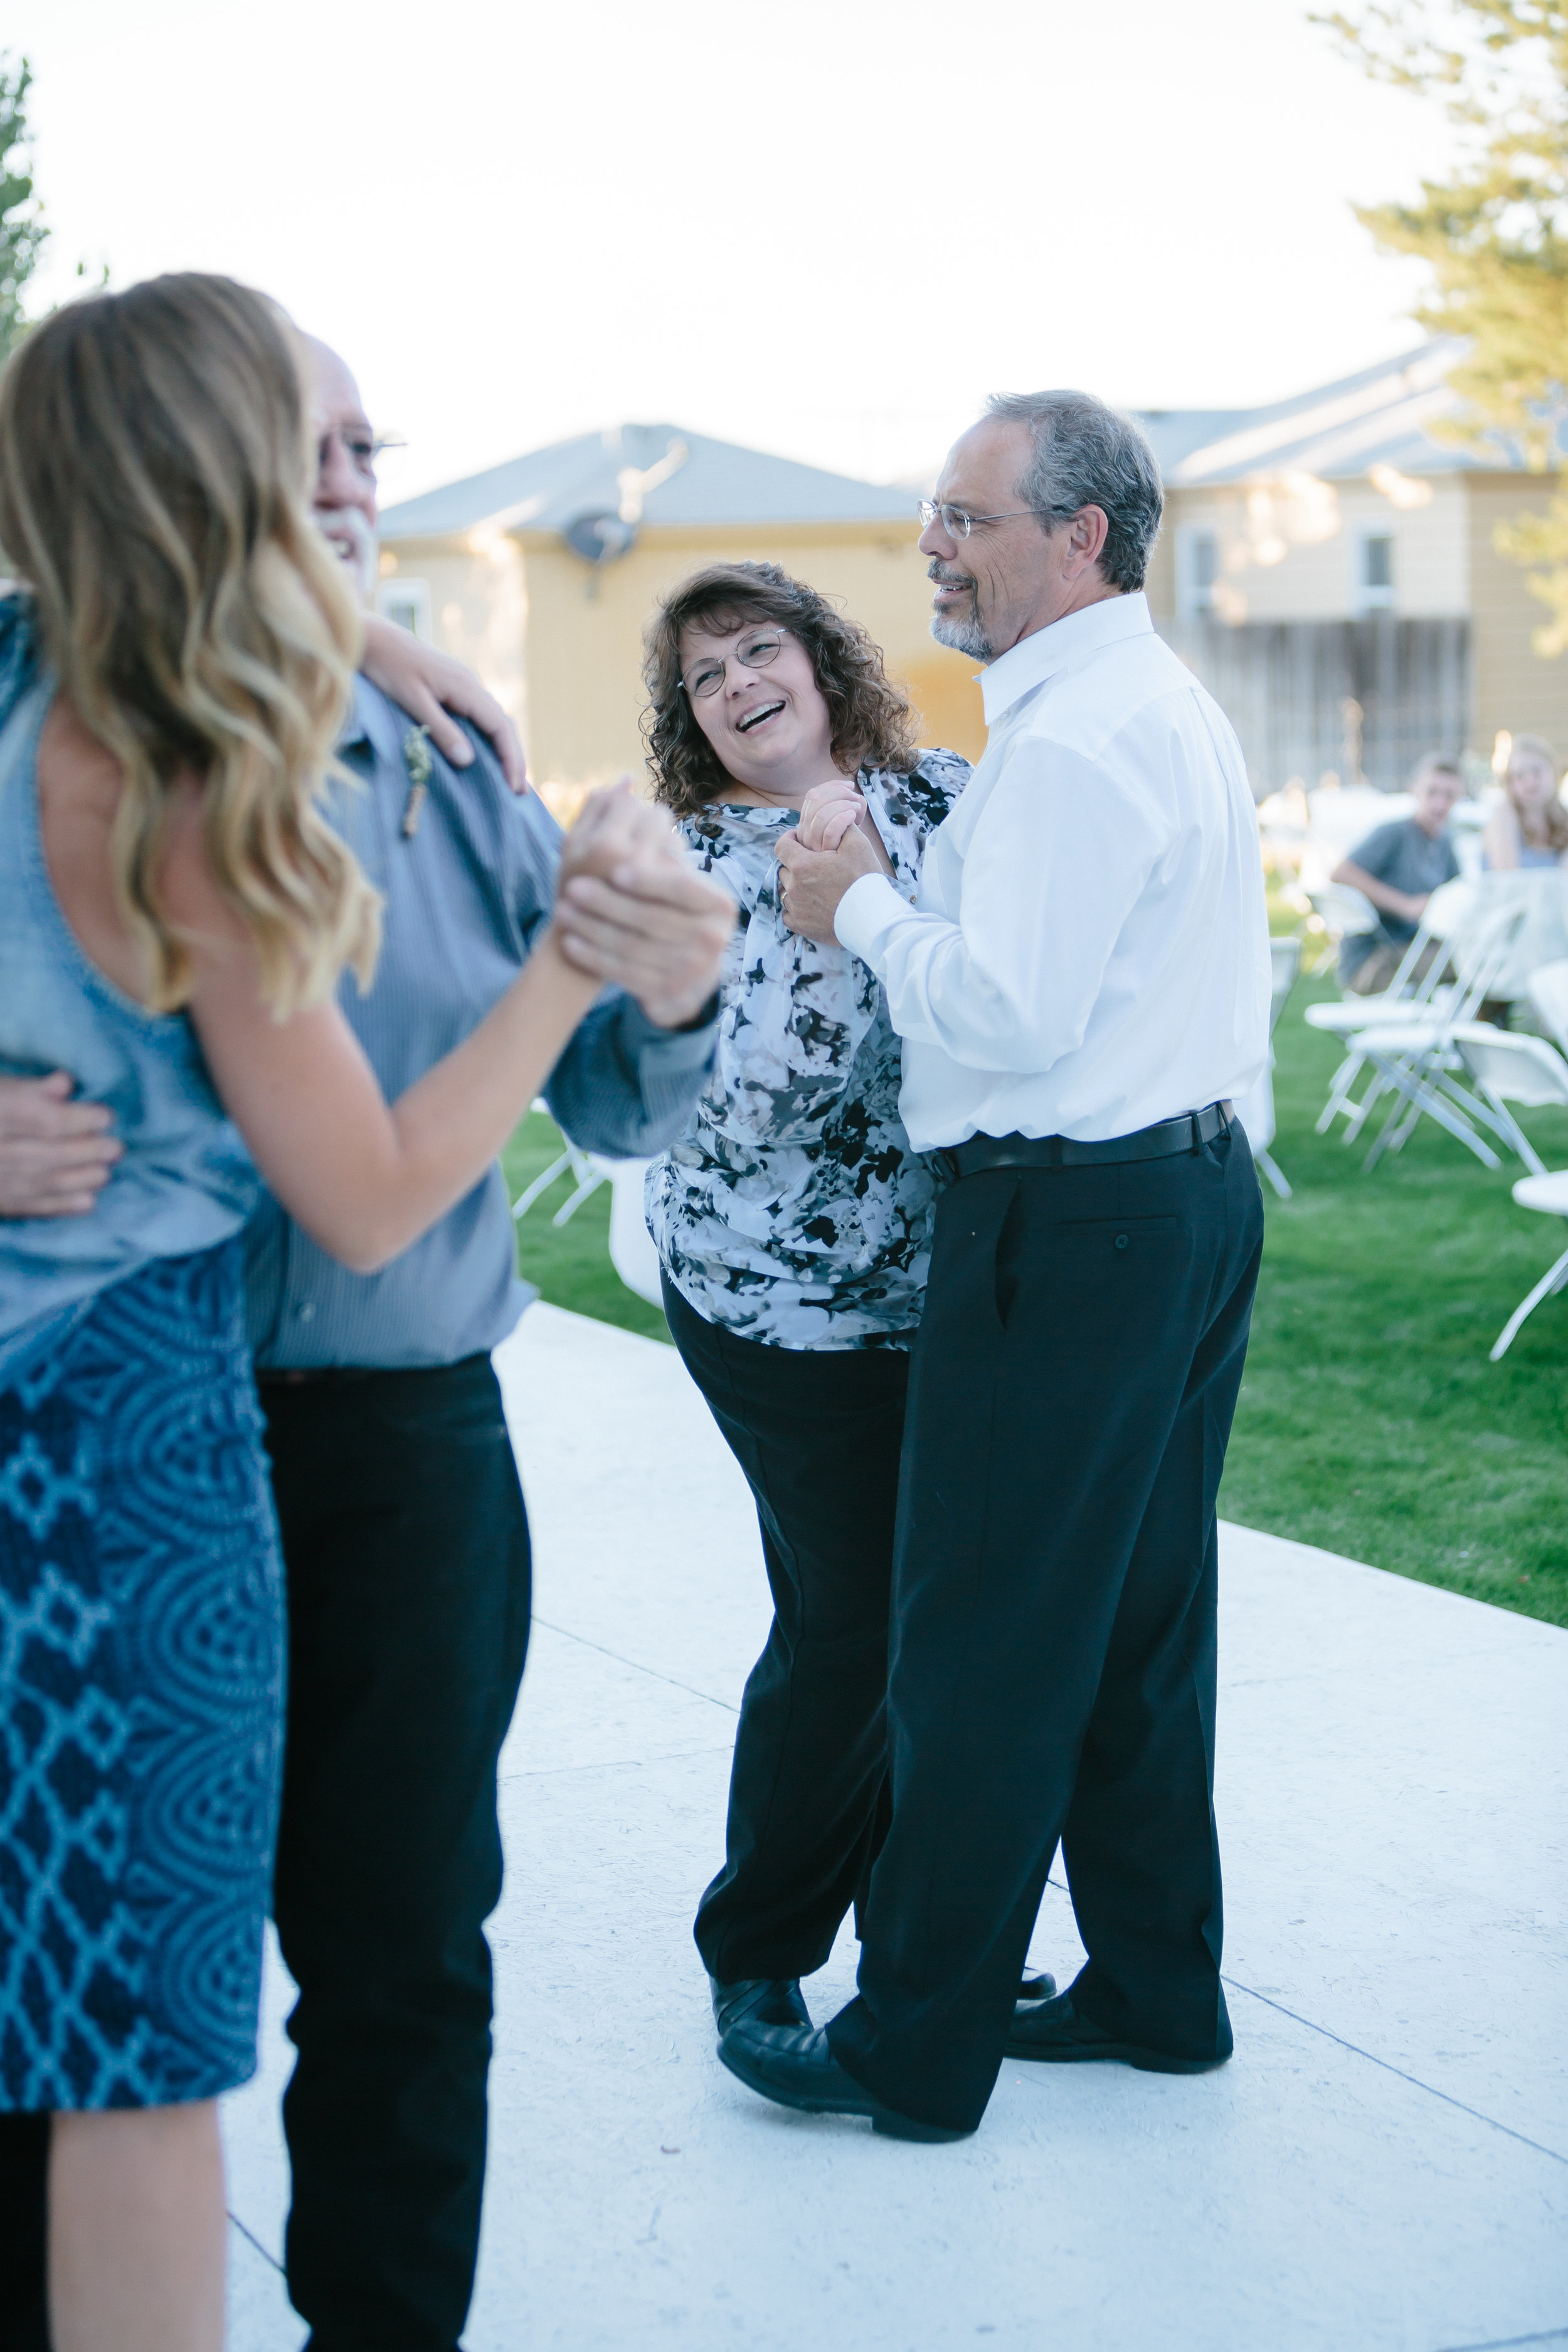 Jordan & Shantel Married - Idaho - Corrie Mick Photography-334.jpg